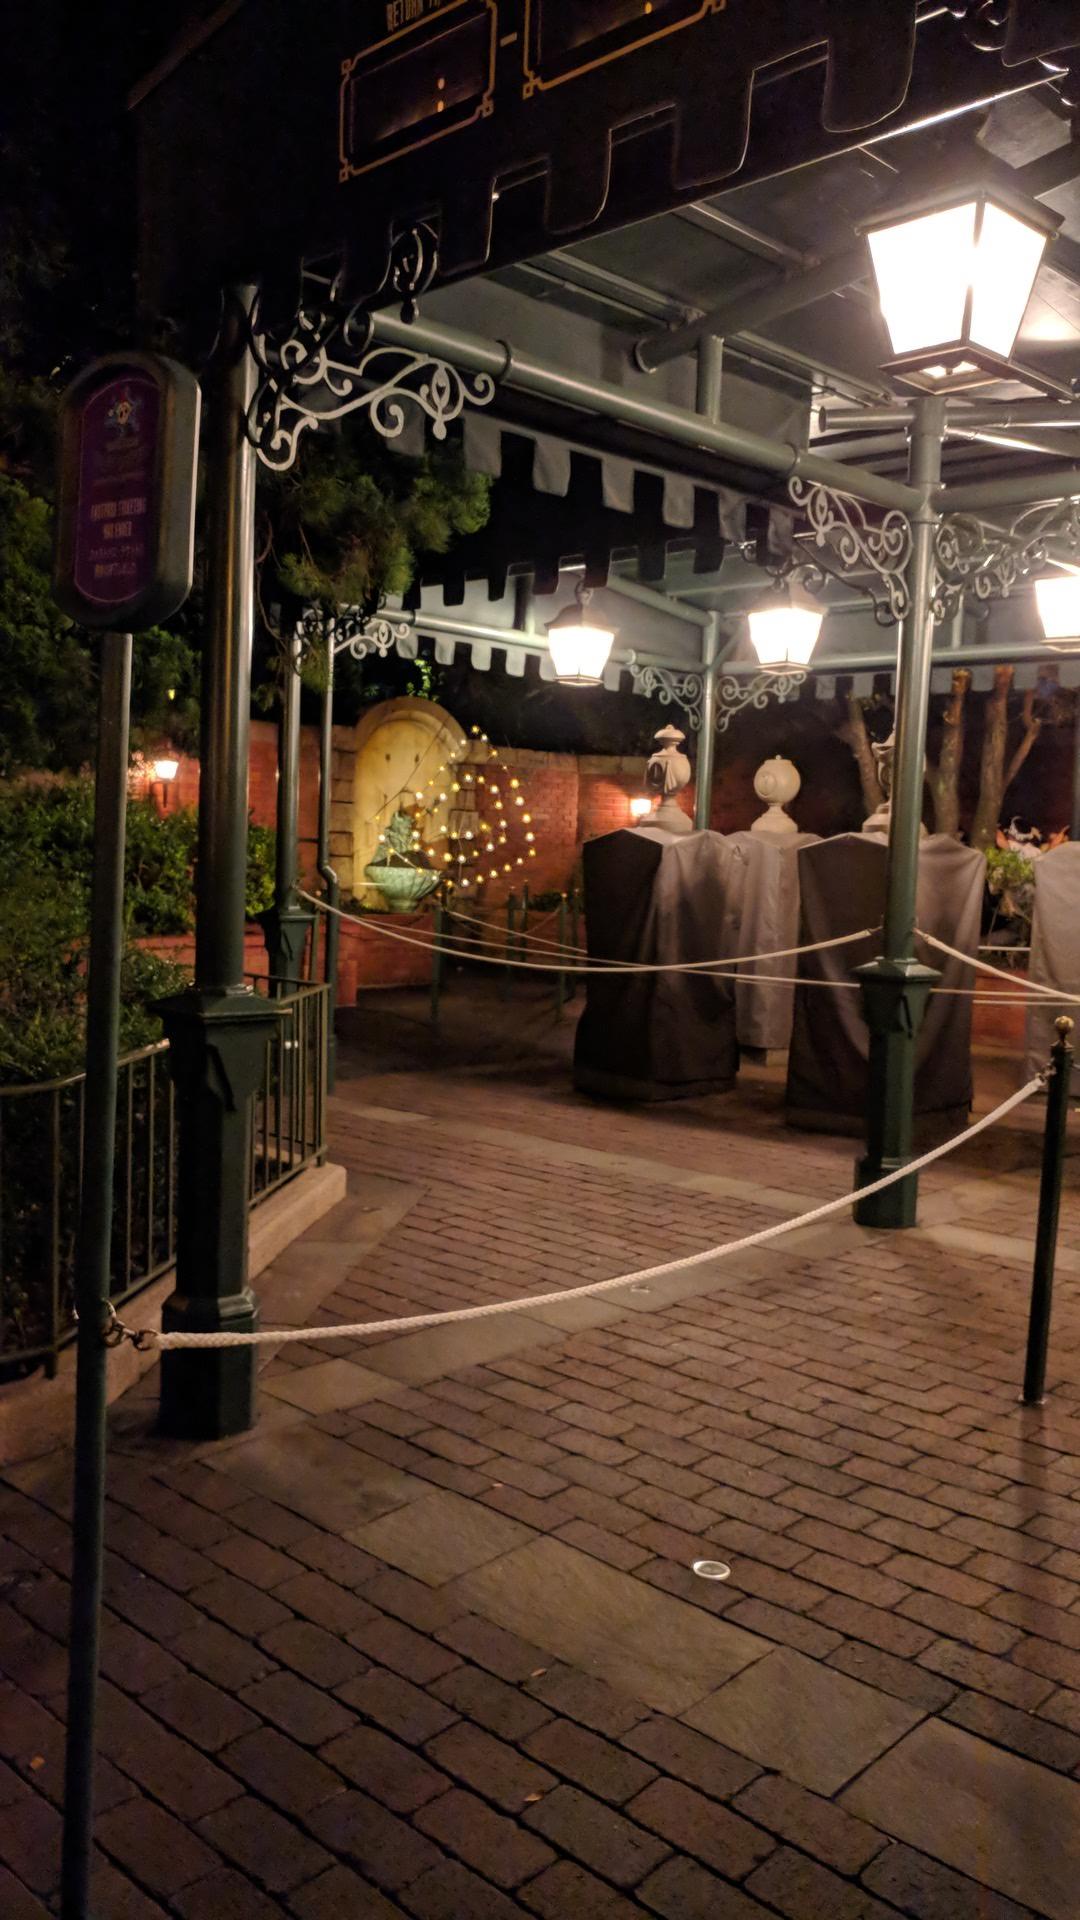 The Haunted Mansion - Tokyo Disneyland